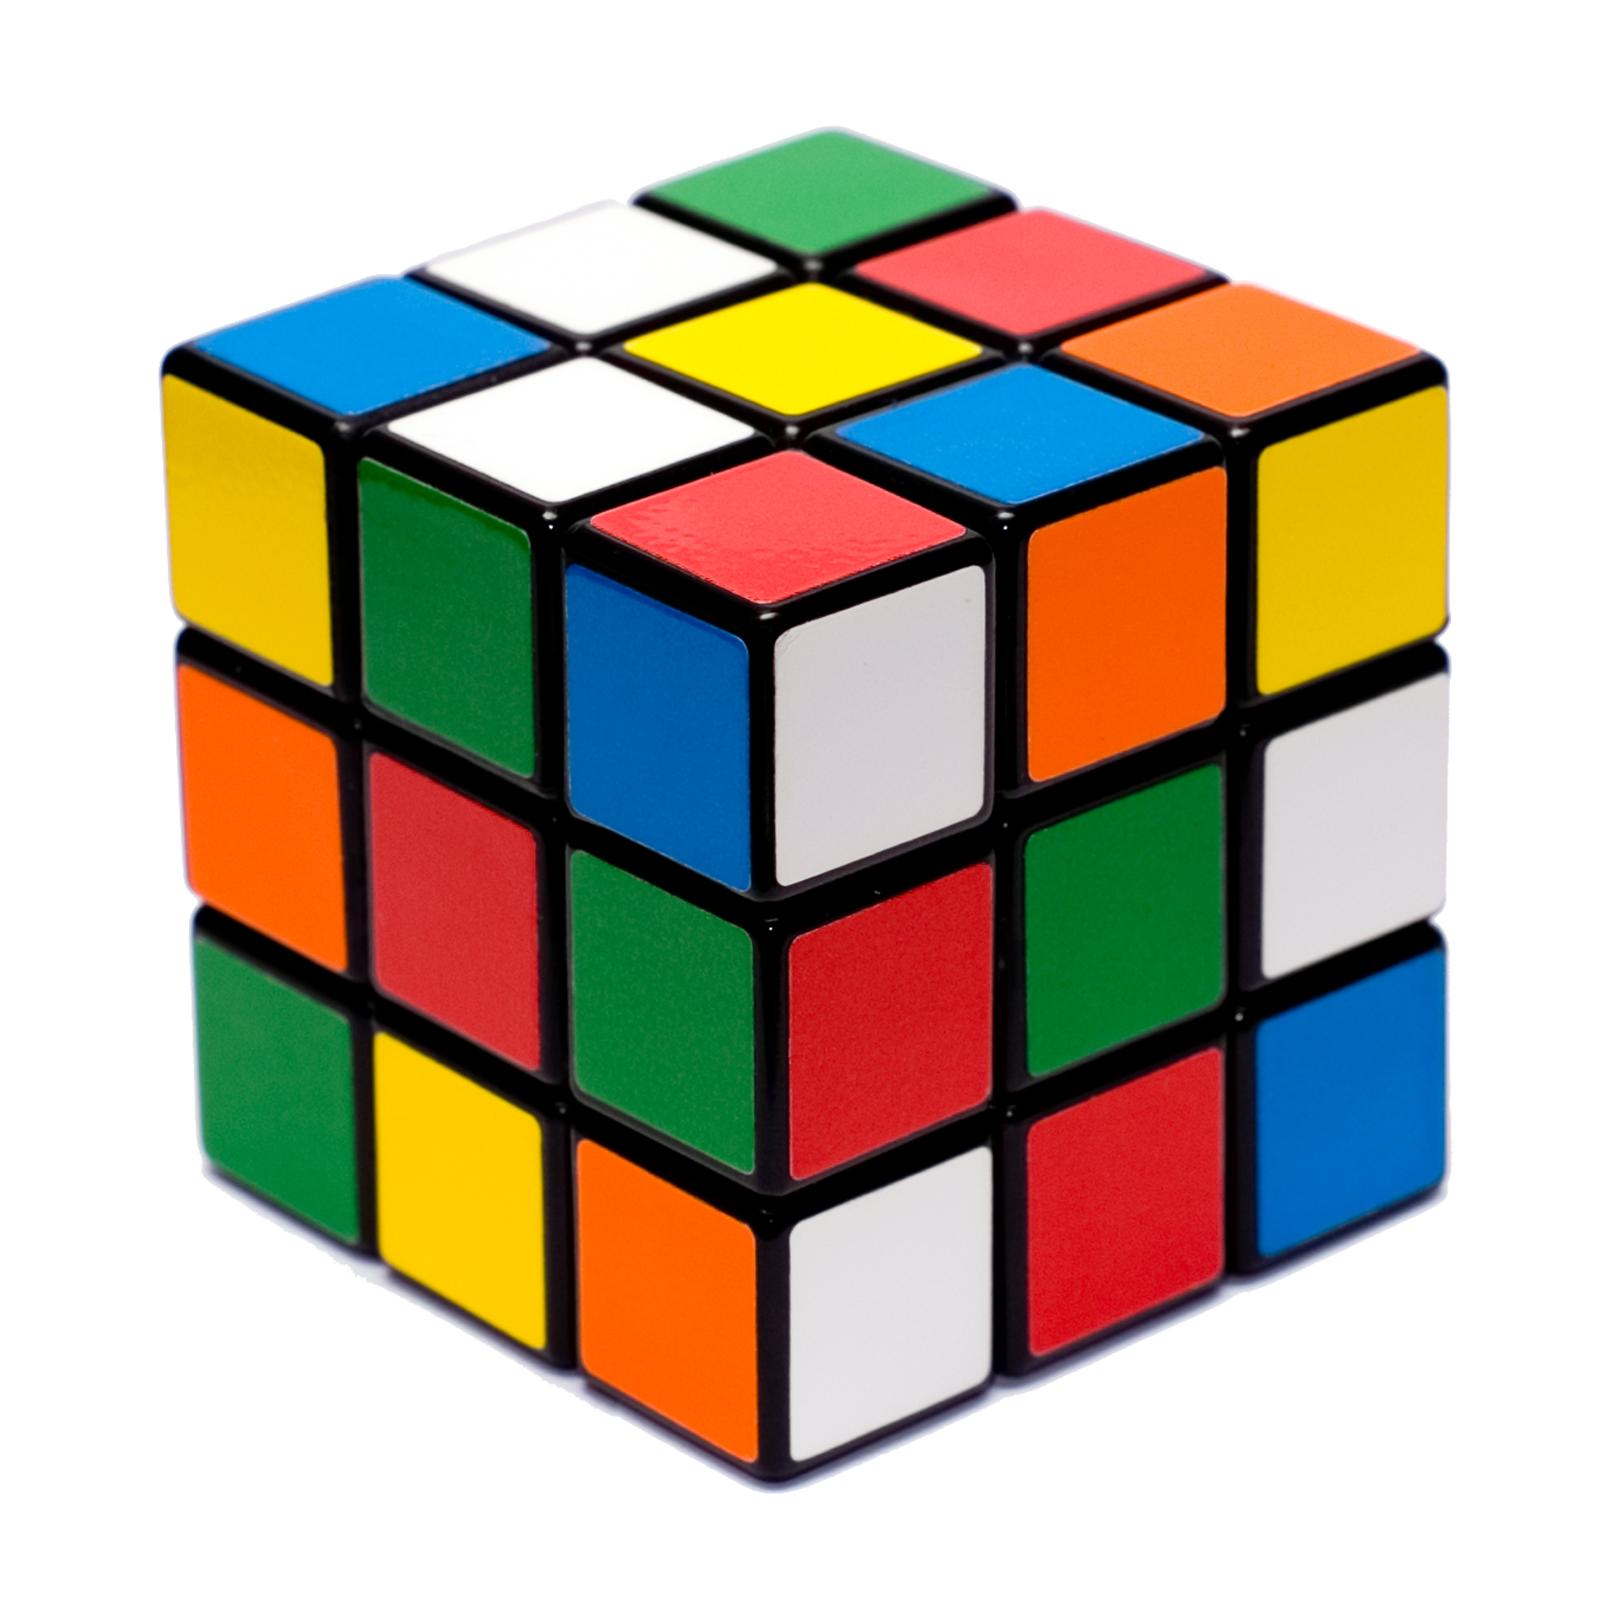 CS 5234 - Algorithms at Scale (Fall 2019)